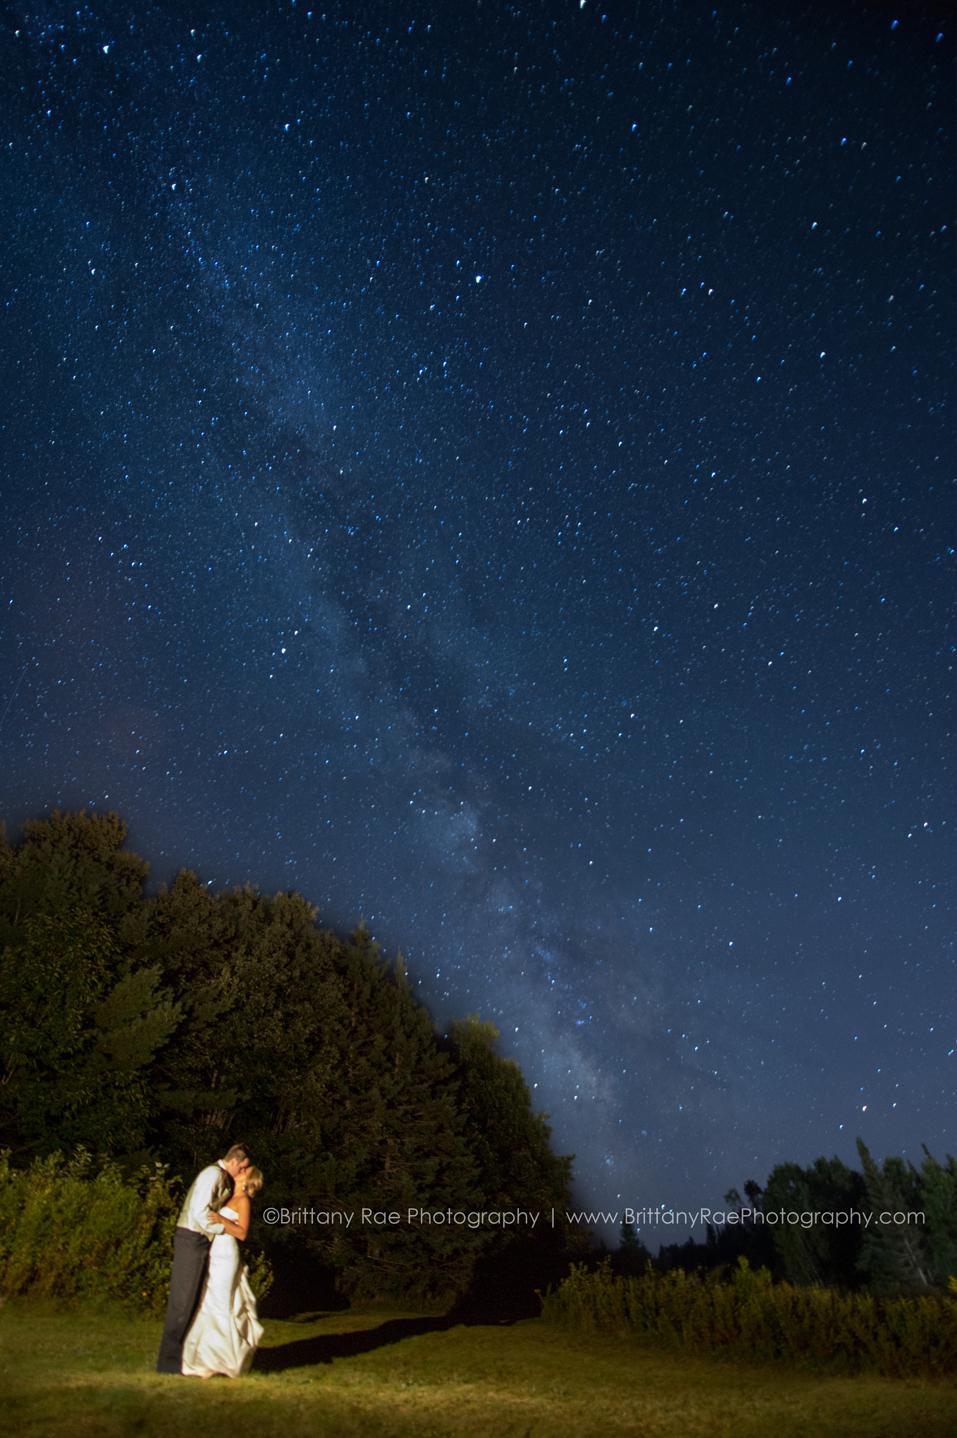 Milky Way Wedding Photographer, Brittany Rae Photography